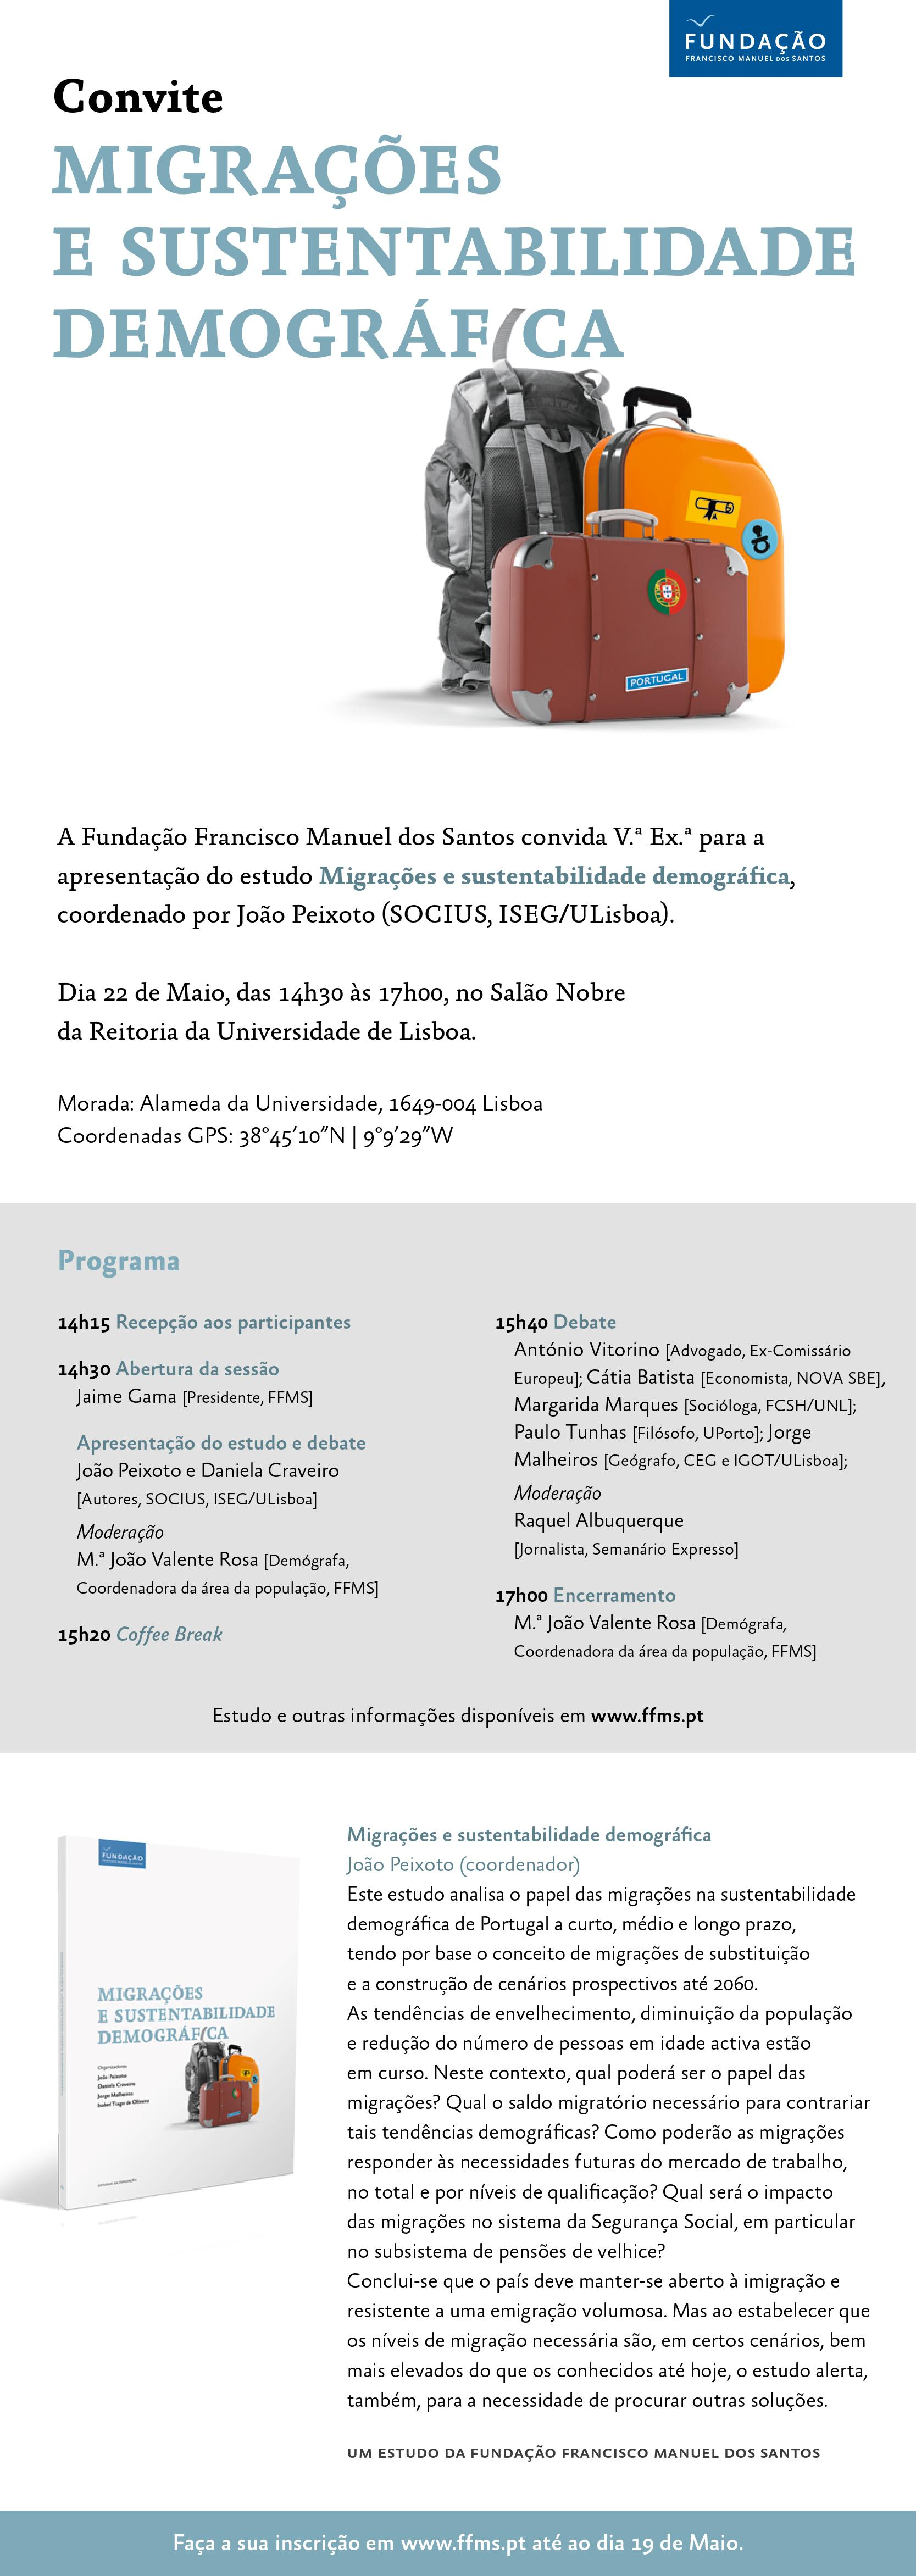 convite-apresentacao-estudo-migracoes-e-sustentabilidade-demografica